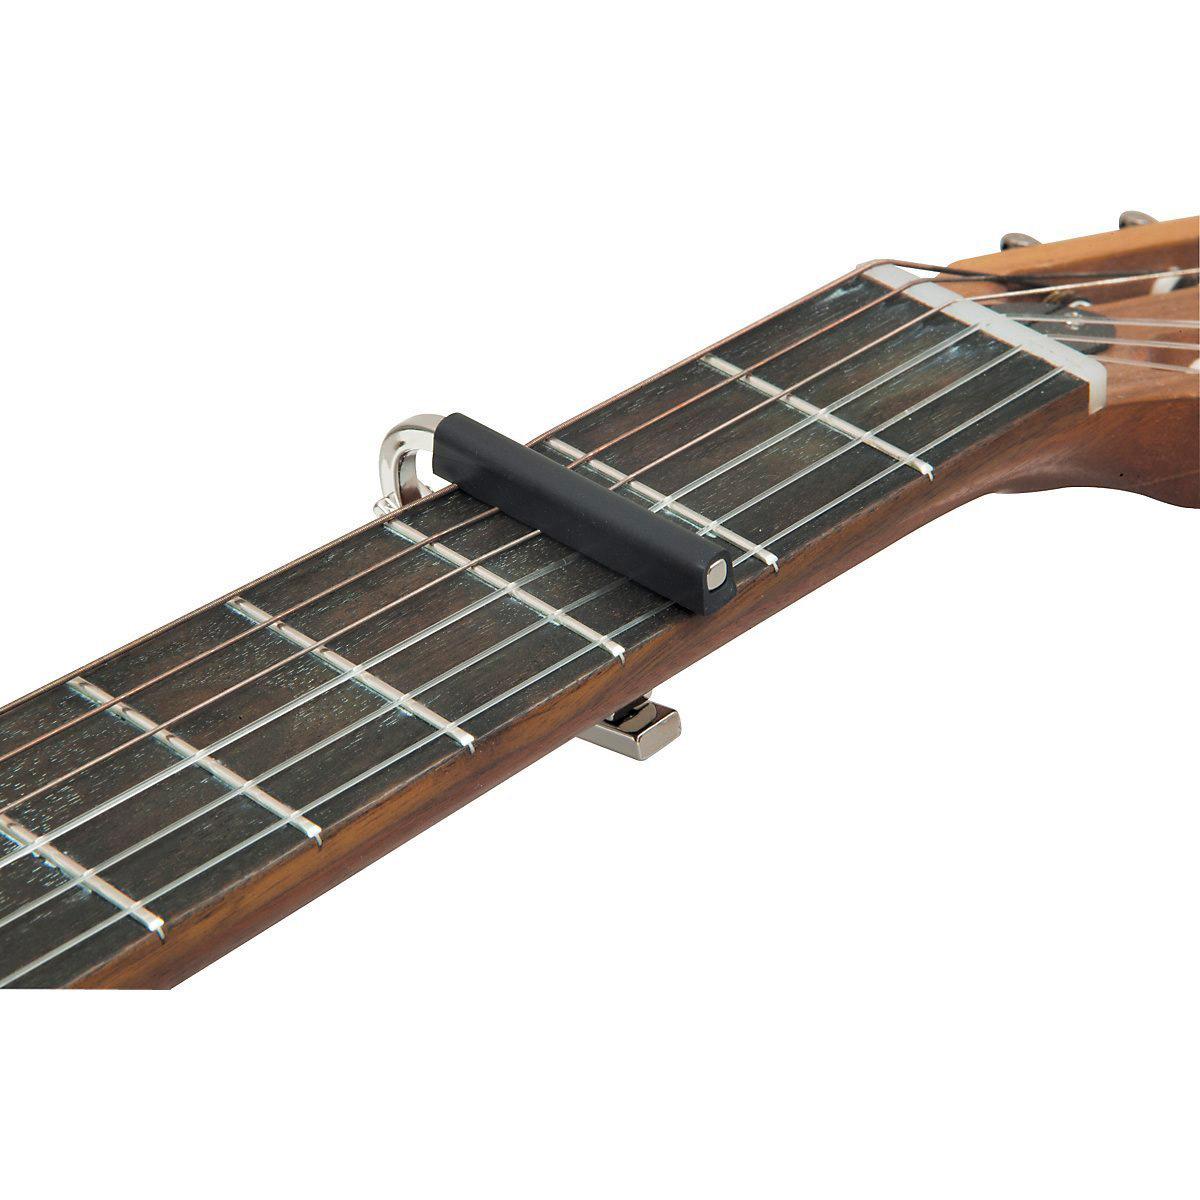 Shubb L2 Lite Series Capo - Classical Guitar - Silver